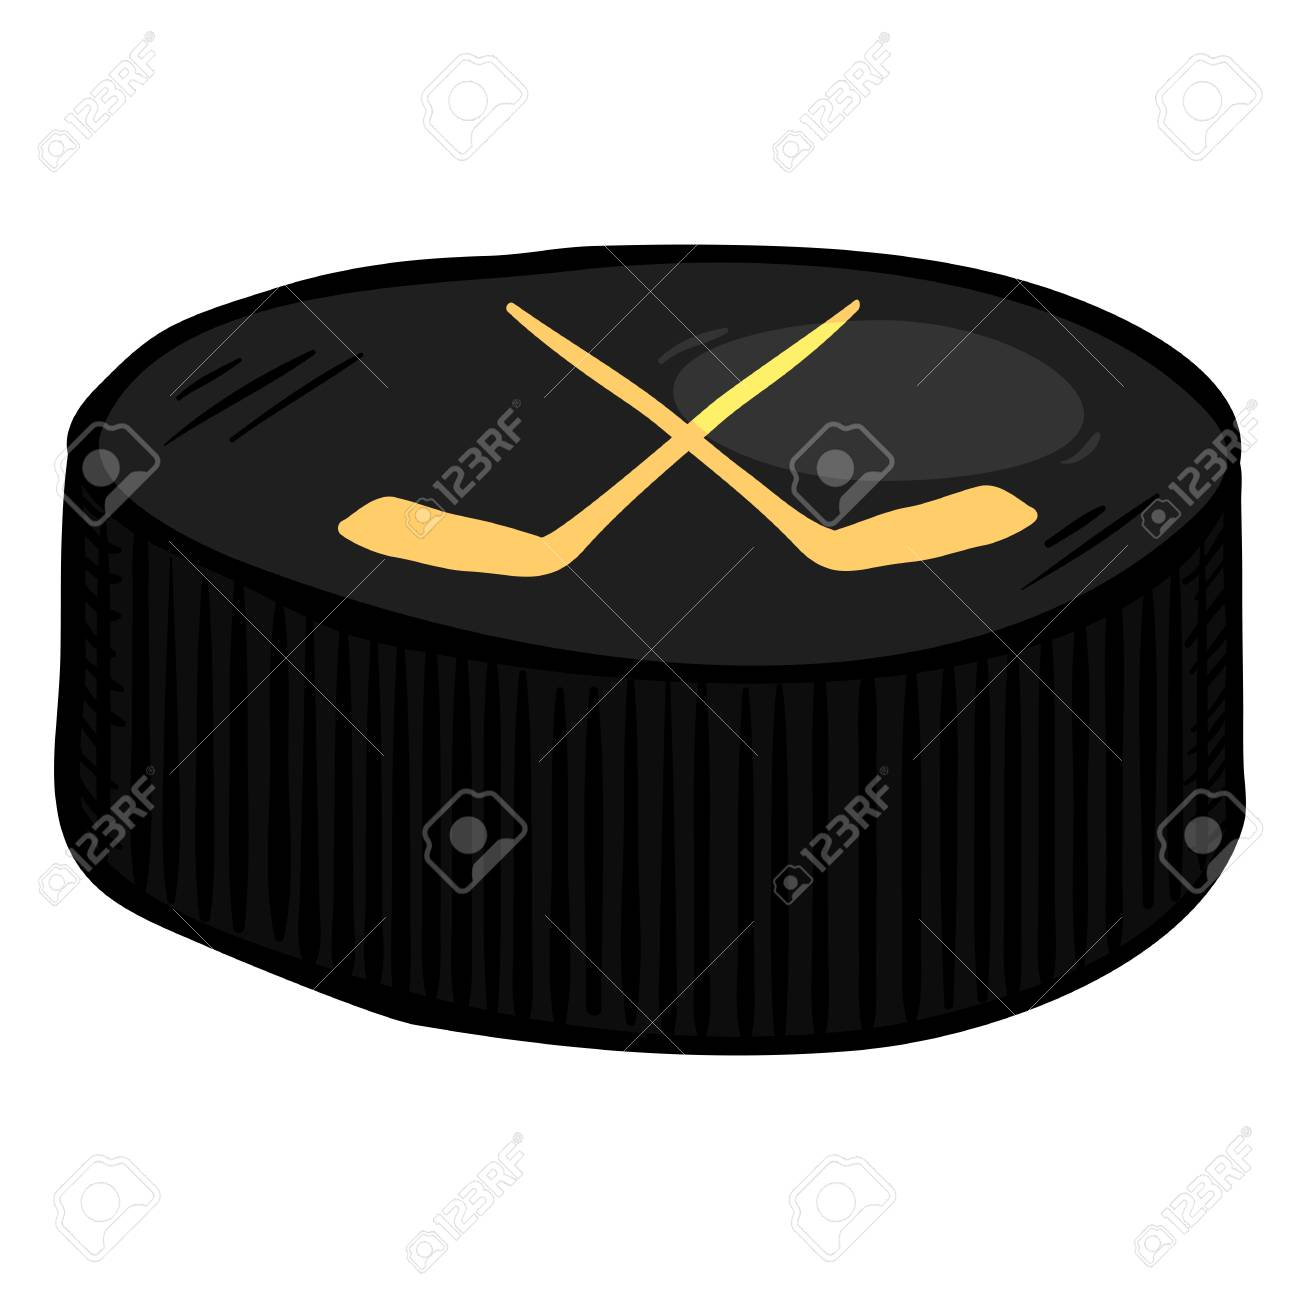 Vector Single Cartoon Black Puck for Ice Hockey.